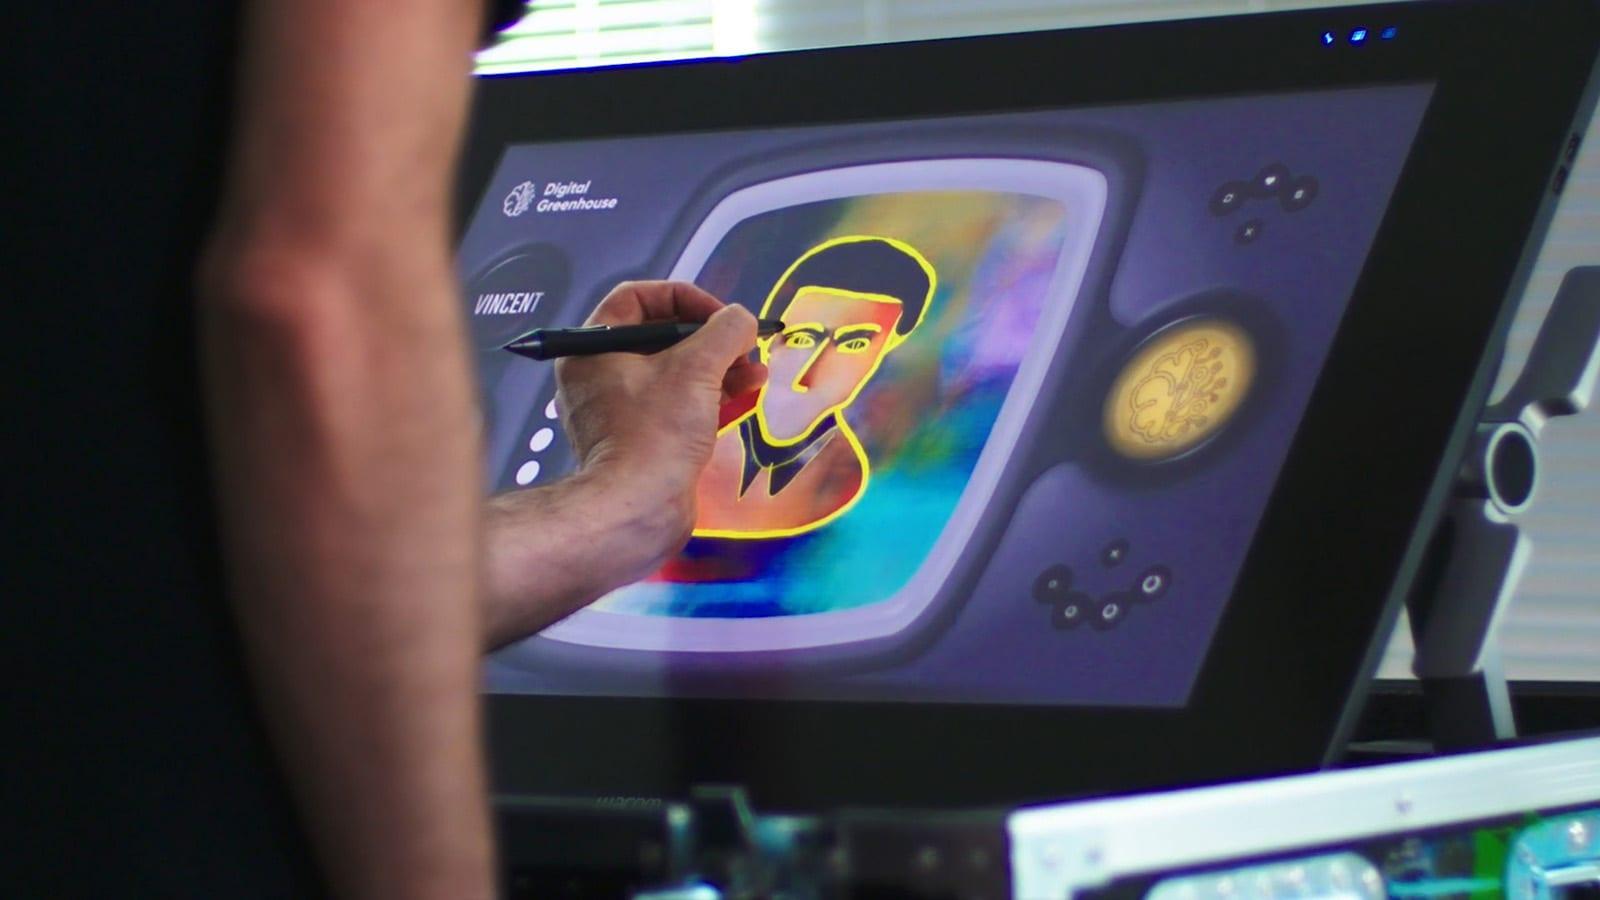 'Vincent' AI transforms your rough sketch into a Van Gogh